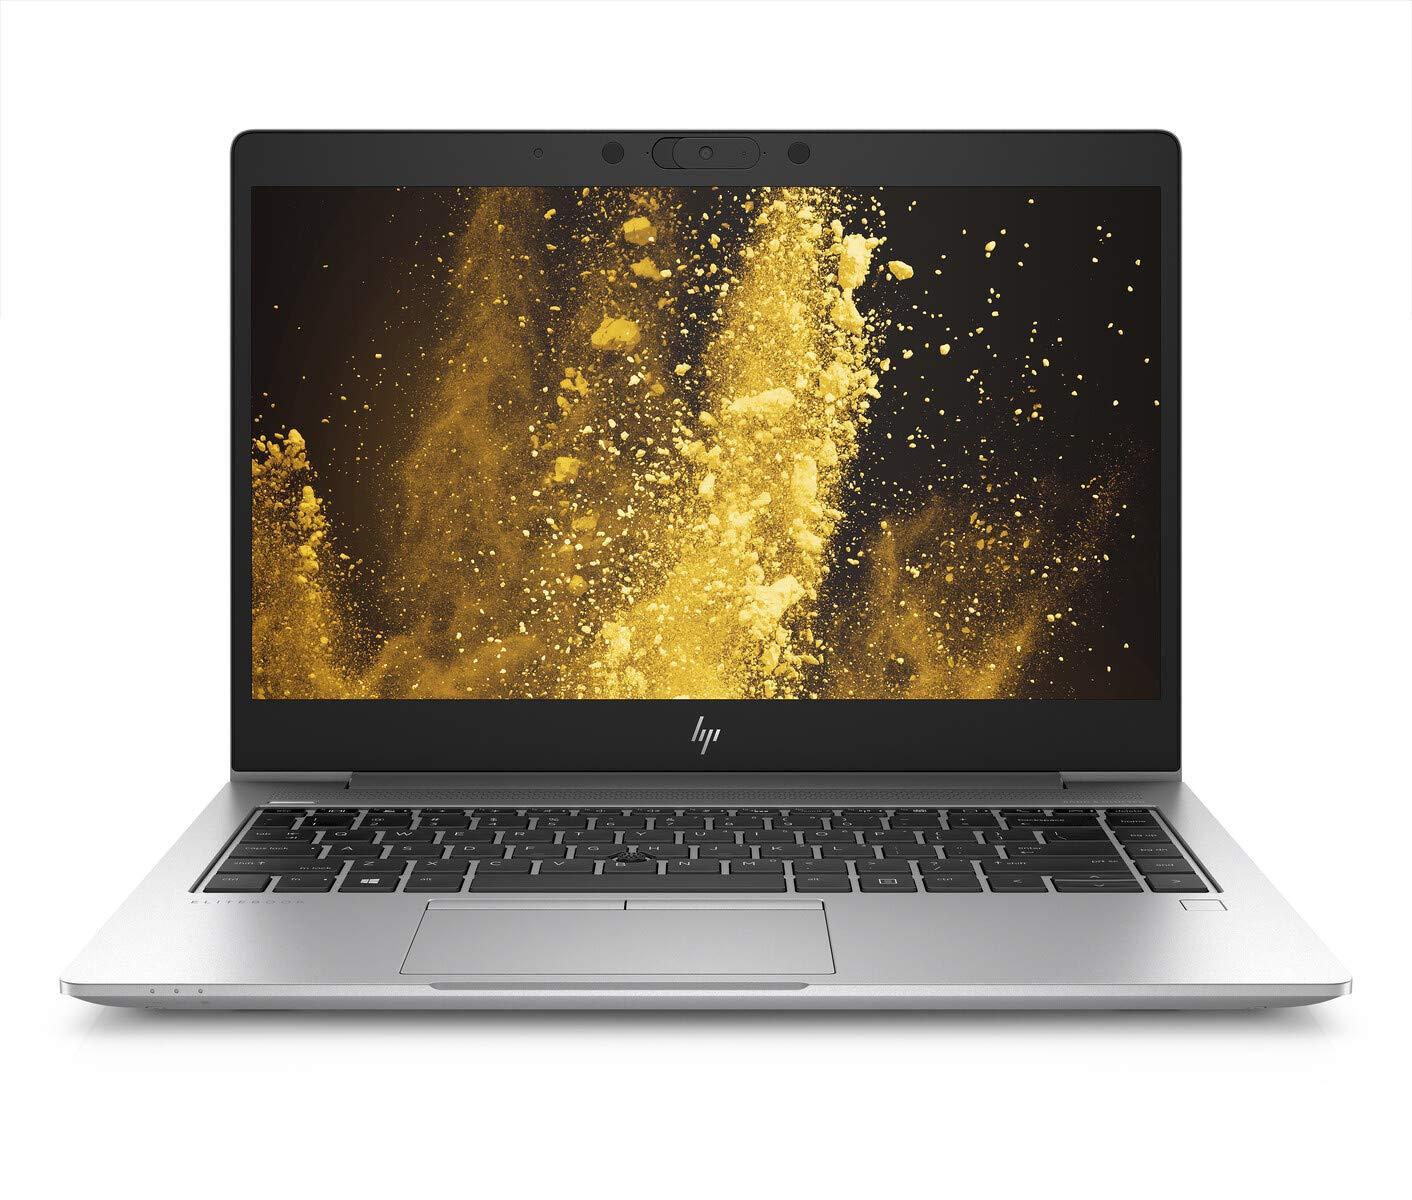 "HP EliteBook 745 G6 14"" Touchscreen Notebook - 1920 x 1080 - Ryzen 7 3700U - 16 GB RAM - 512 GB SSD - Windows 10 Pro 64-bit - AMD Radeon Vega - in-Plane Switching (IPS) Technology - English Keybo"